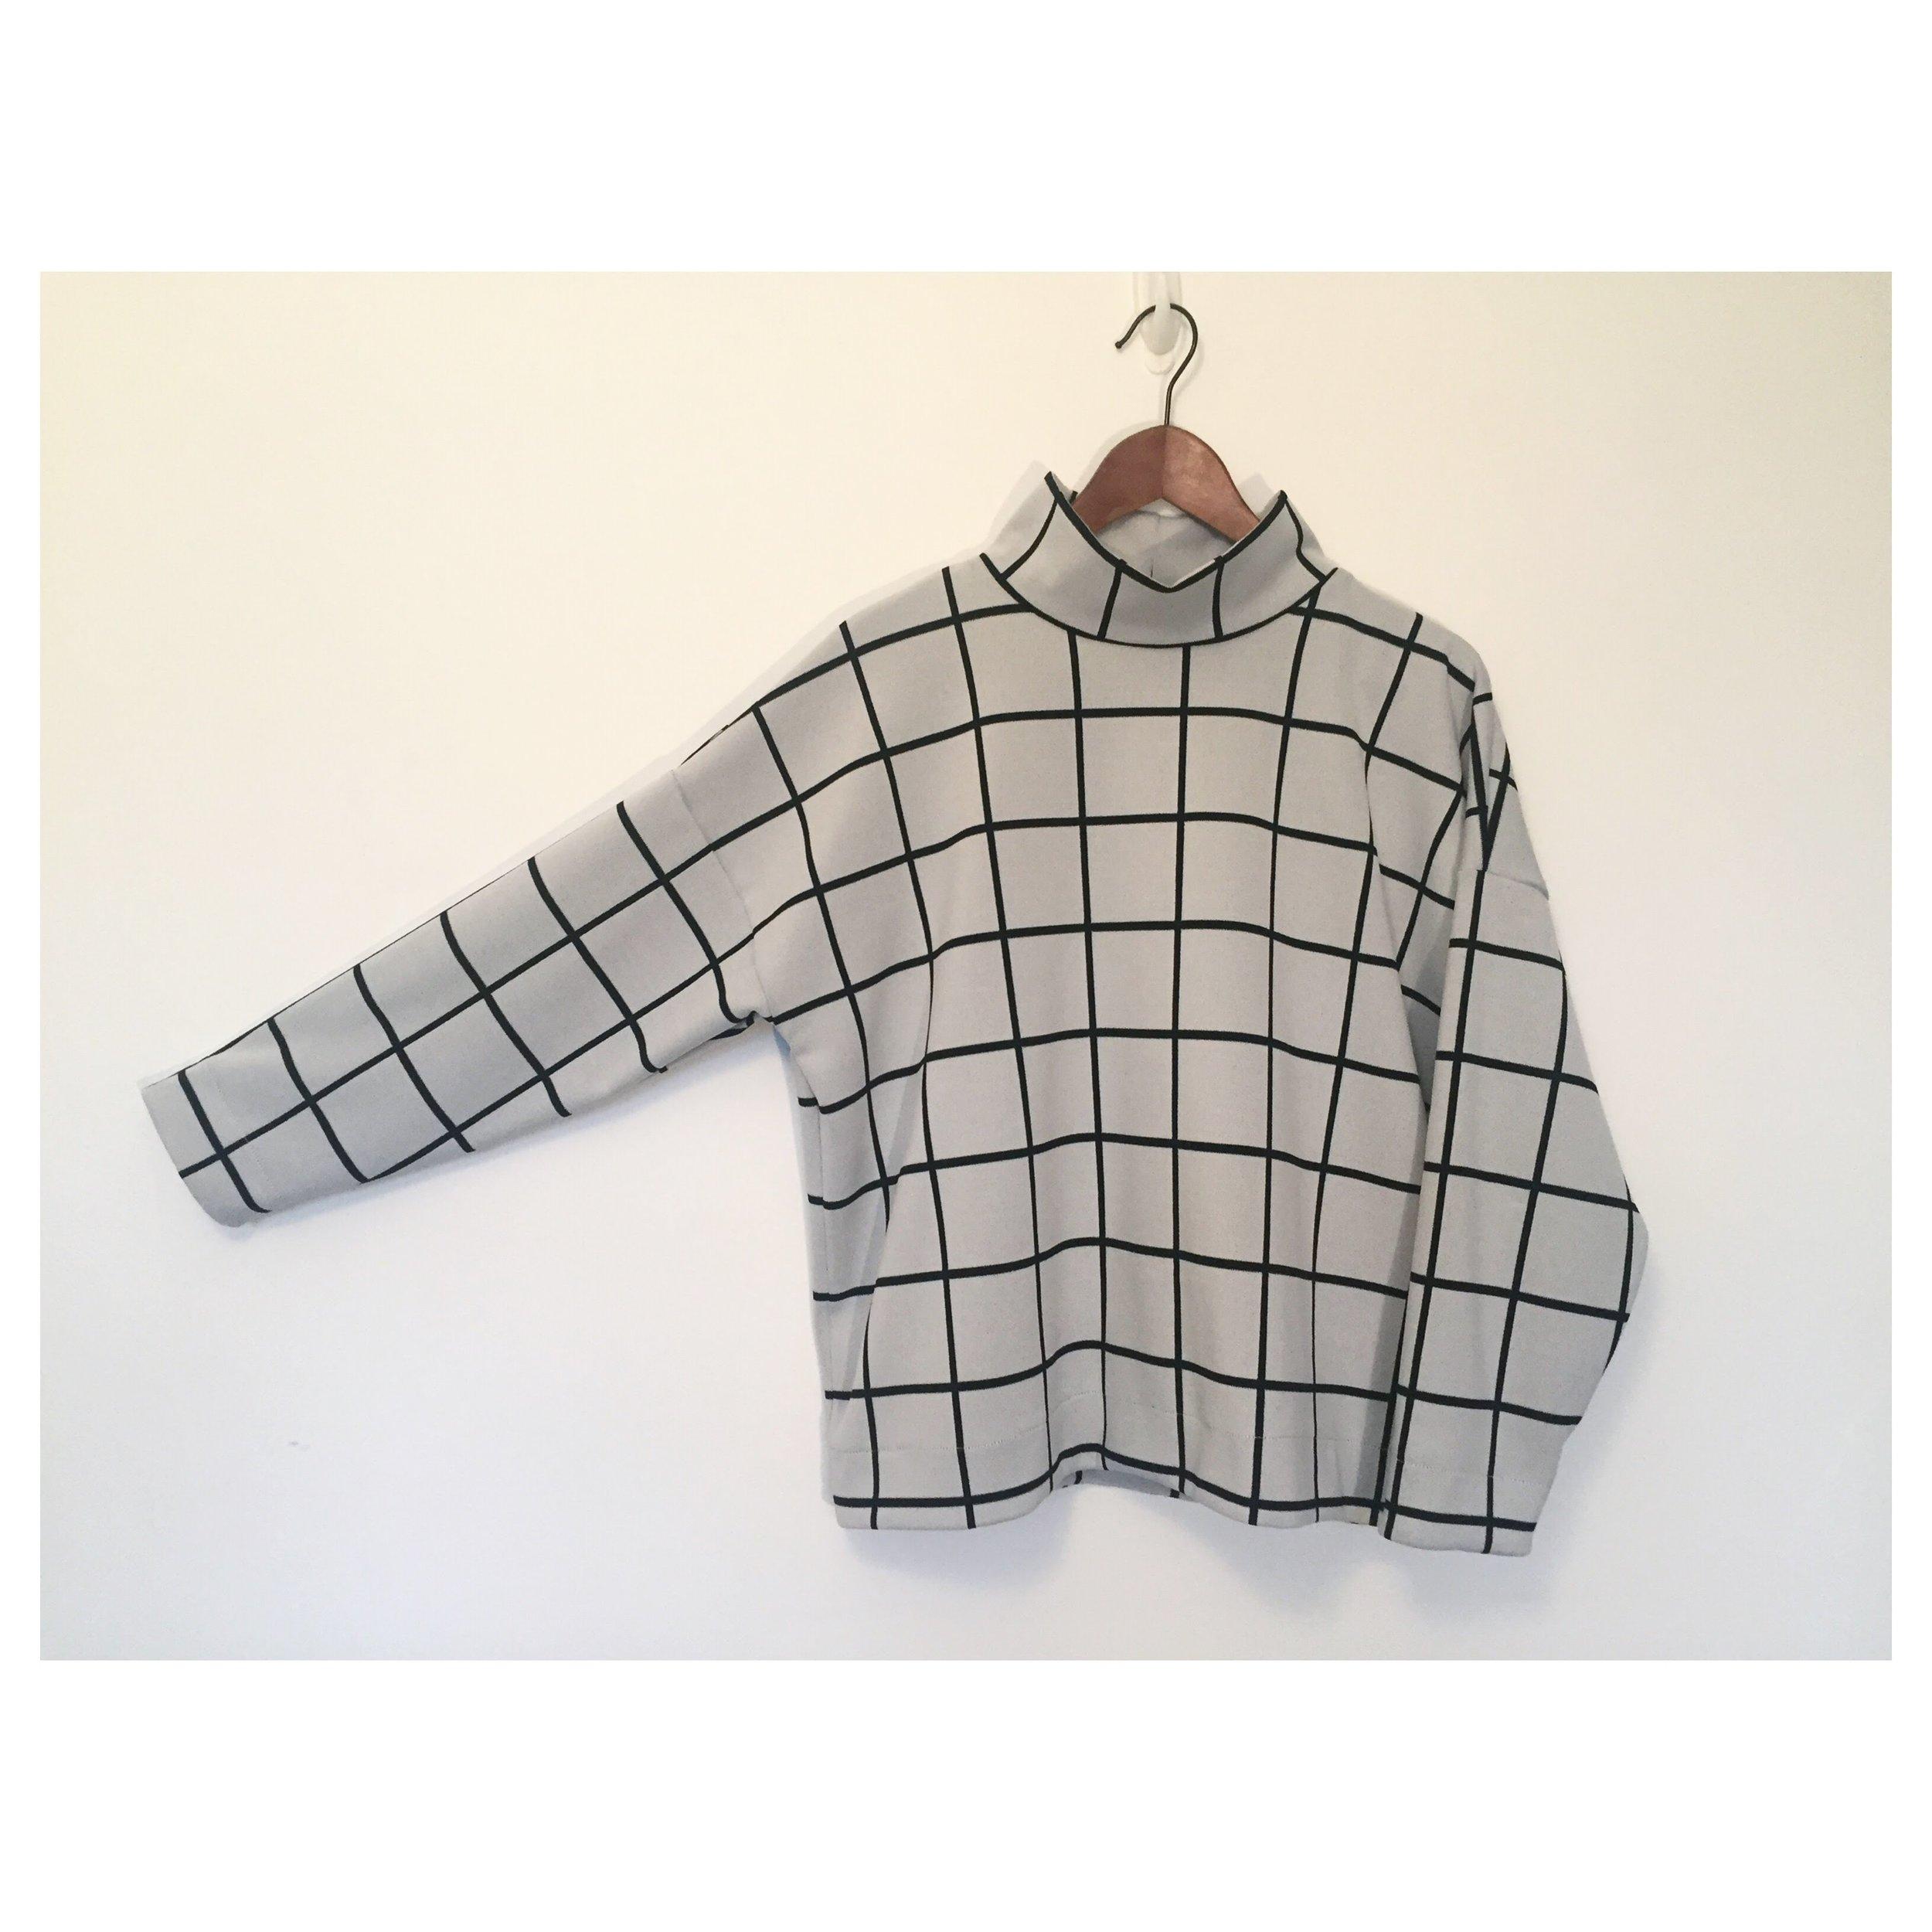 The LB Pullover